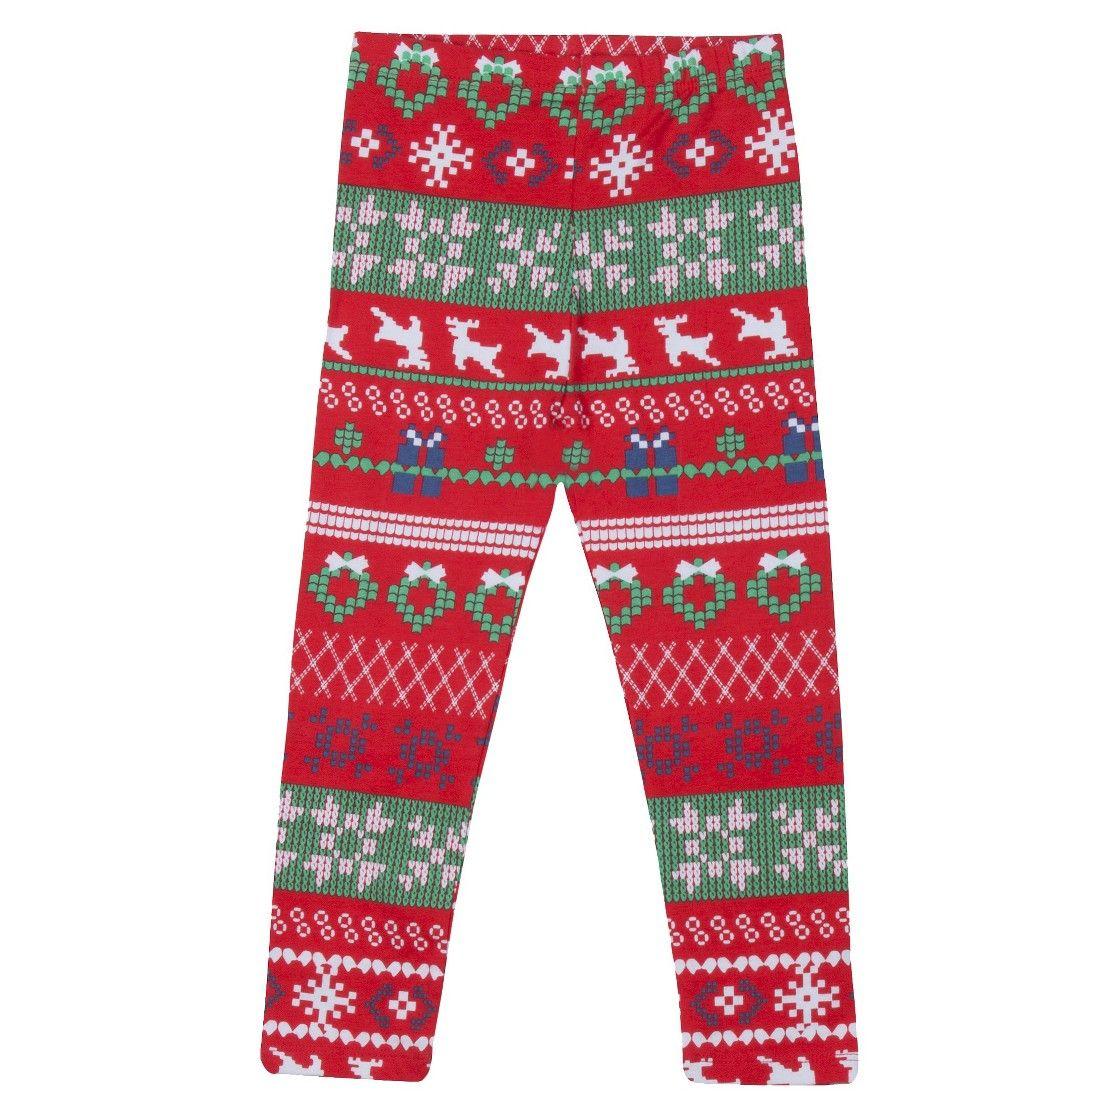 Infant Toddler Girls' Reindeer Fair Isle Sweater Legging - Red $7 ...